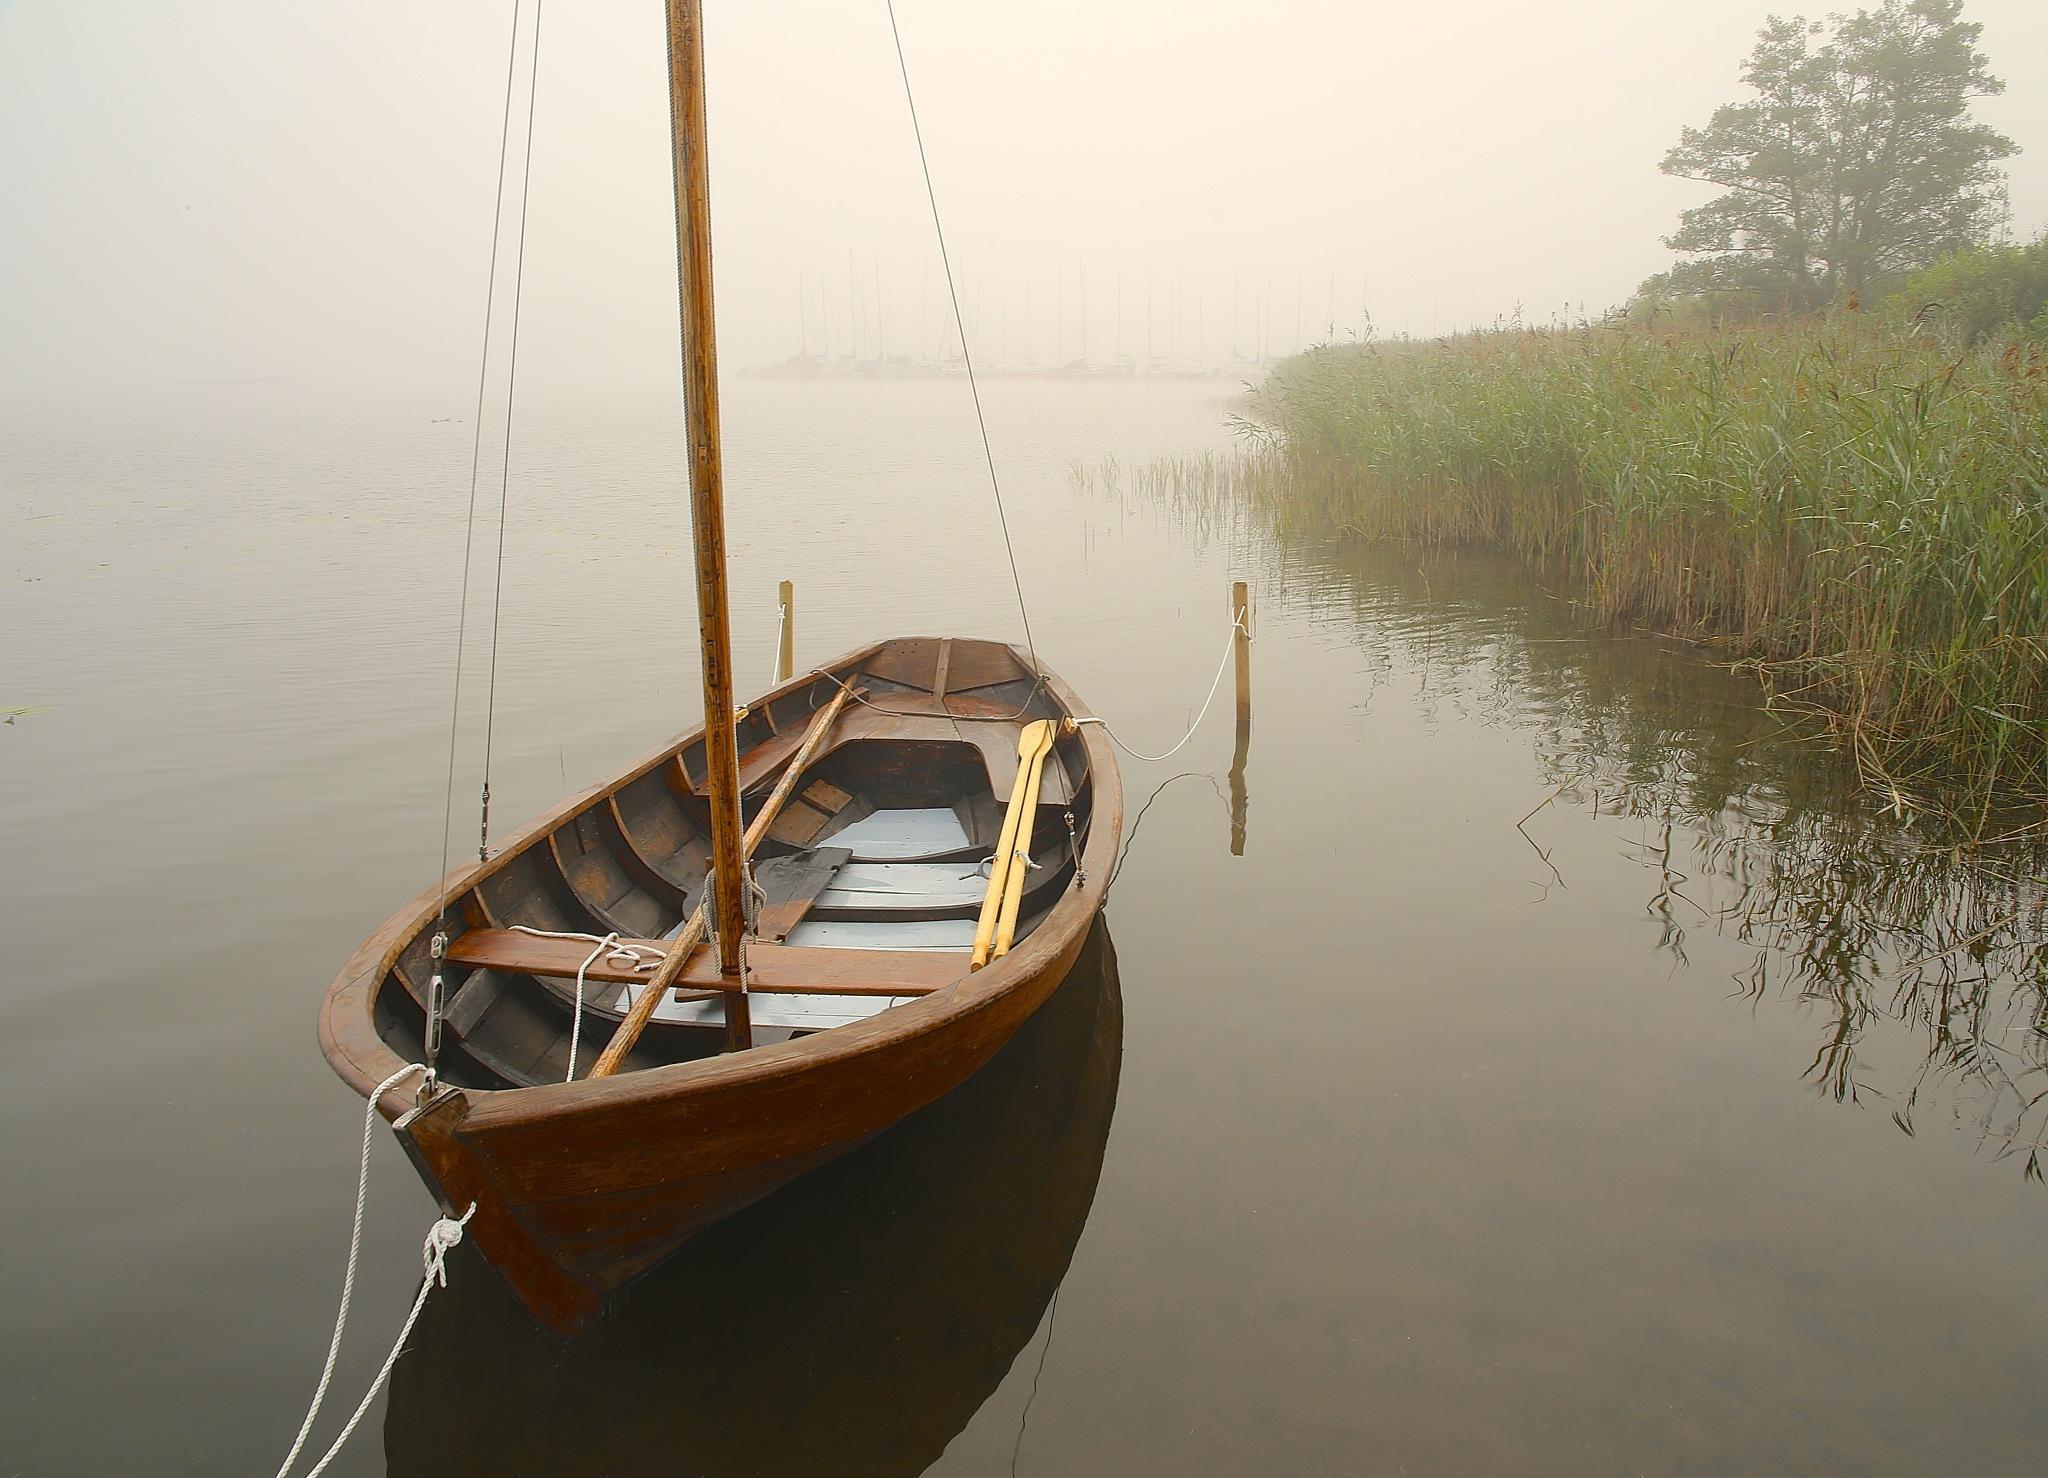 Calm and misty by Bildmartin